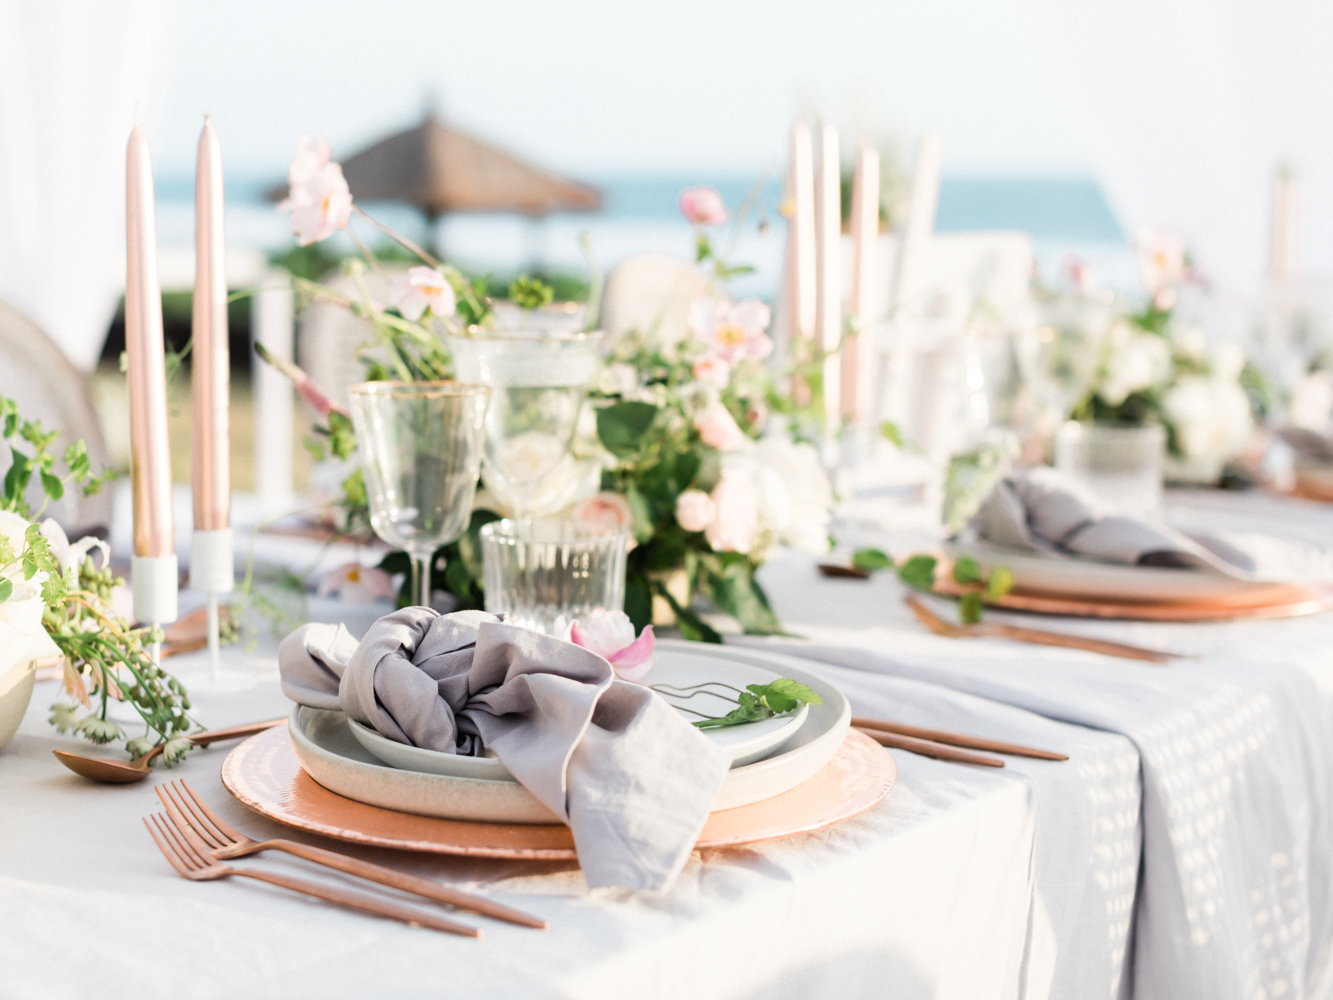 Bali_Real_Wedding_(c)_Rory_Wylie-99.jpg